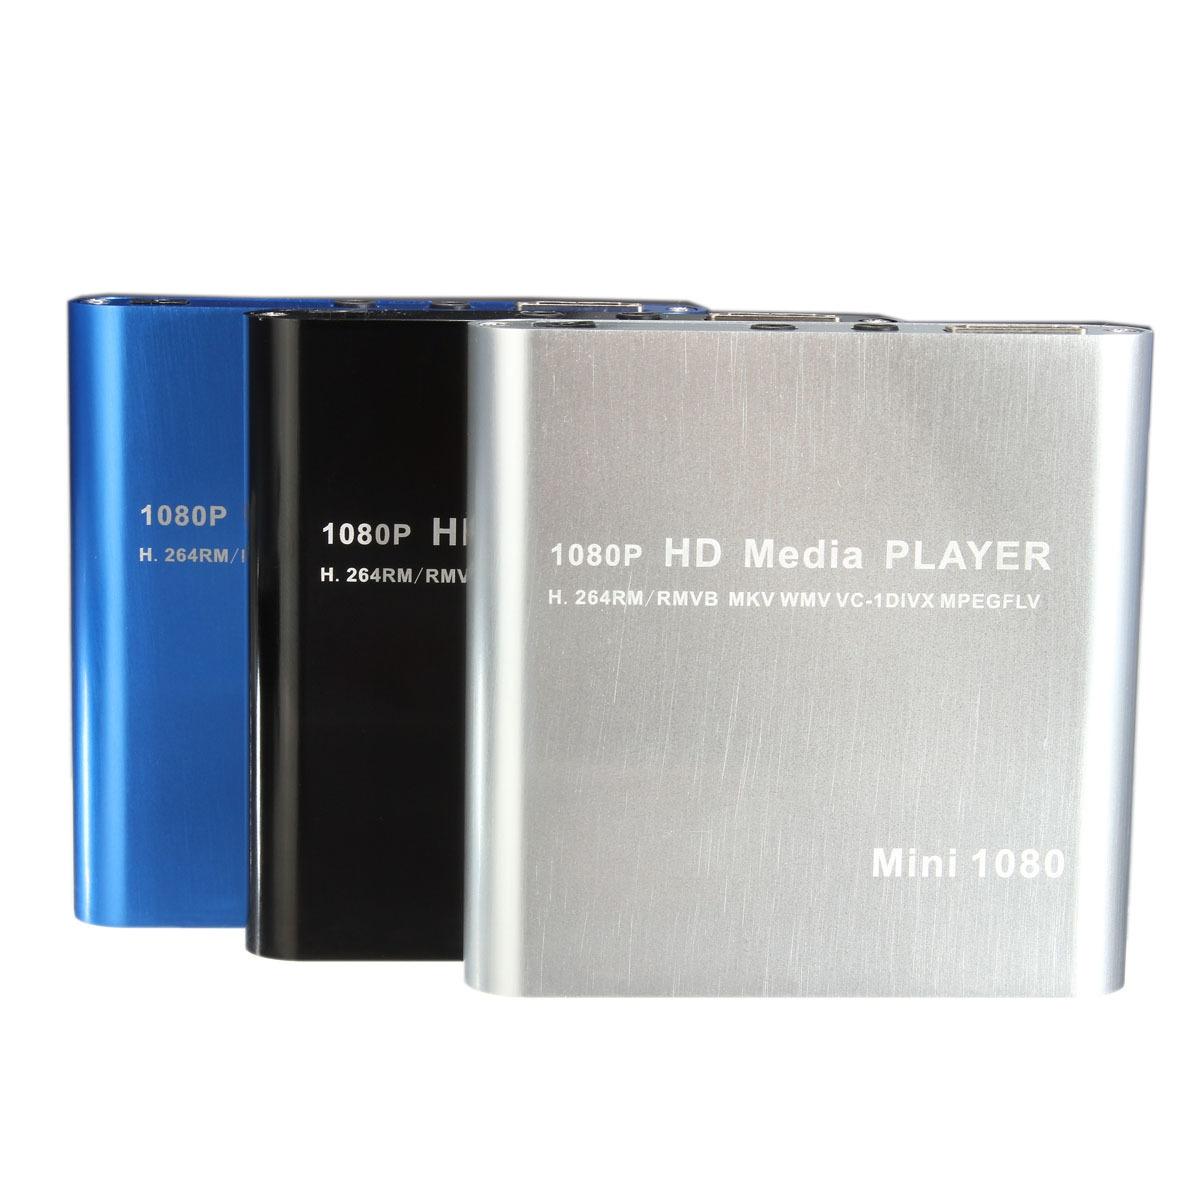 Generic Full HD 1080P USB Media Player With HDMI/AV/SD/MMC